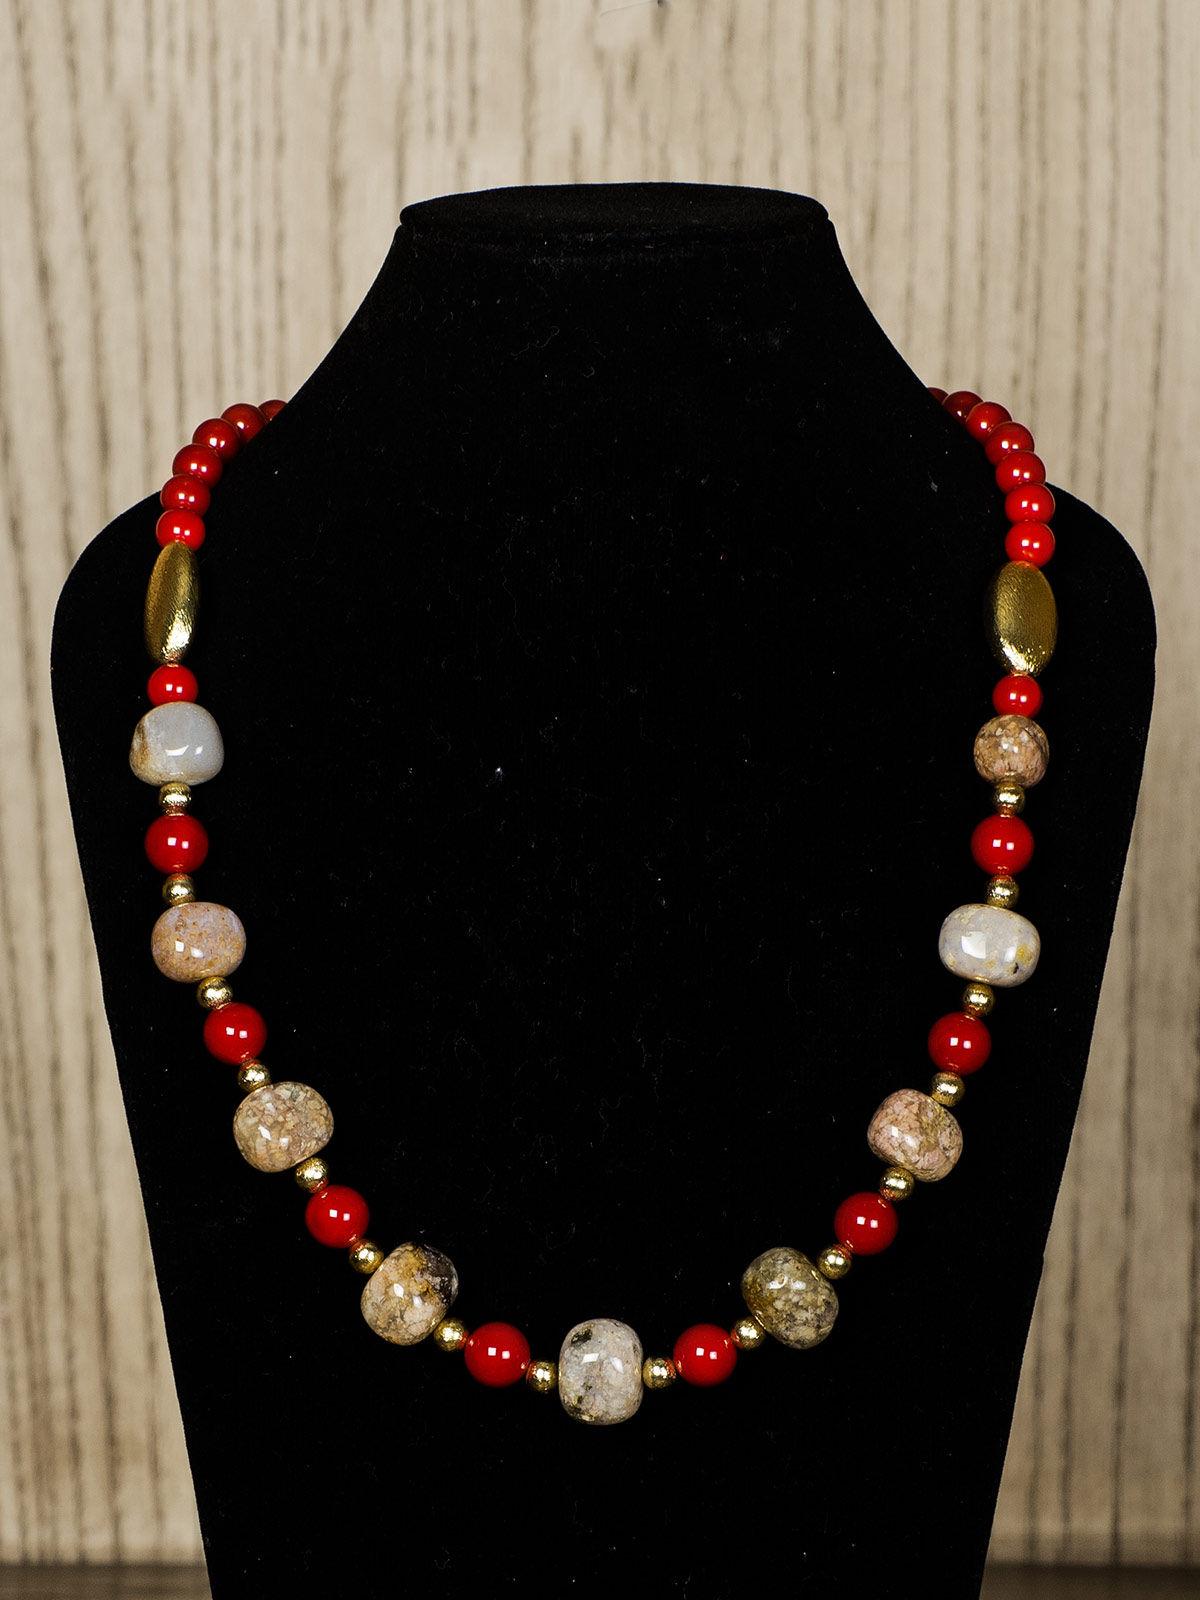 Beige Semiprecious Stone Necklace